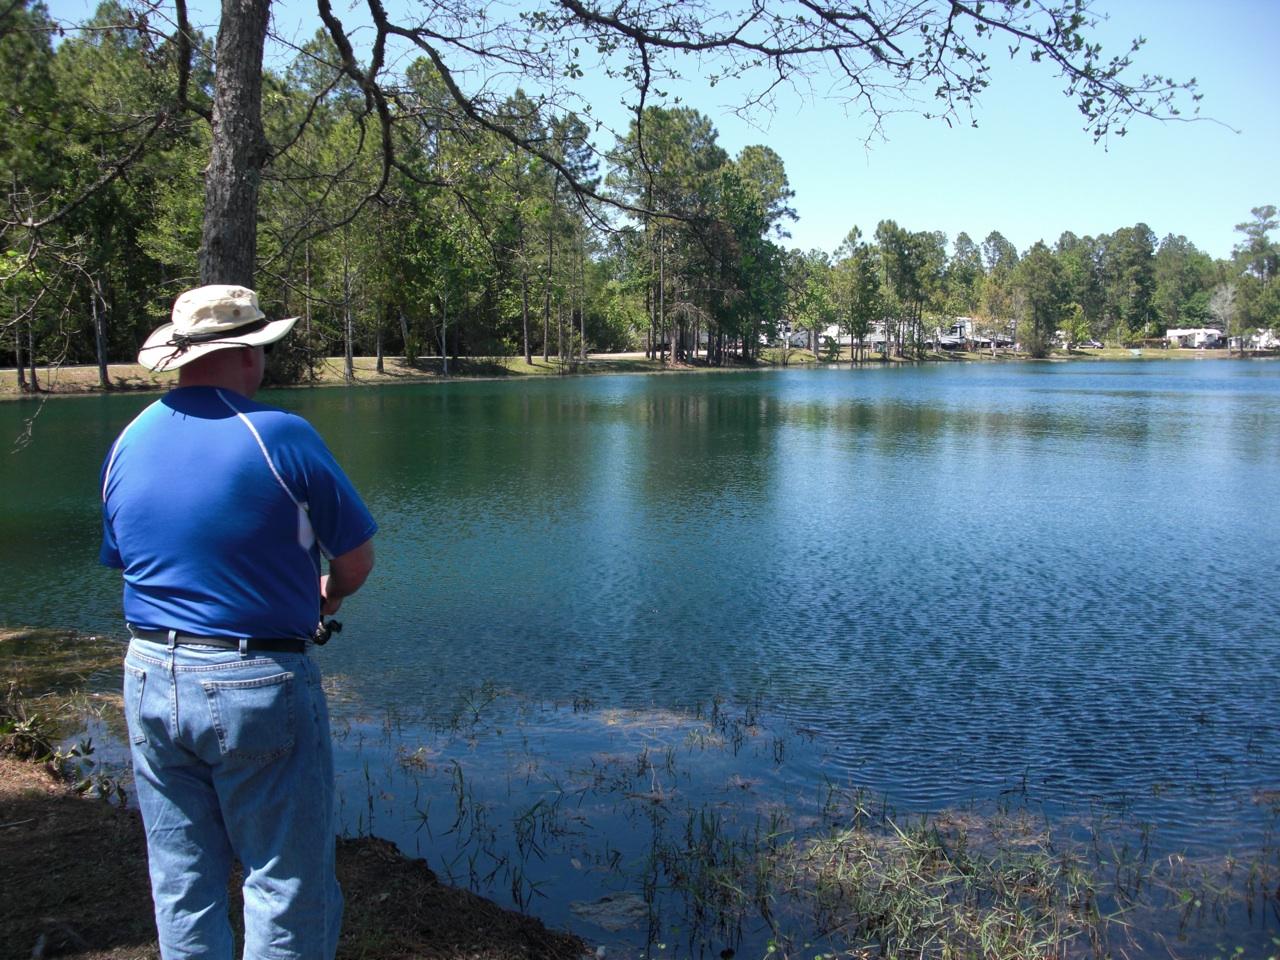 David Fishing at the Lake That Is At The Flamingo Lake RV Resort in Jacksonville, FL